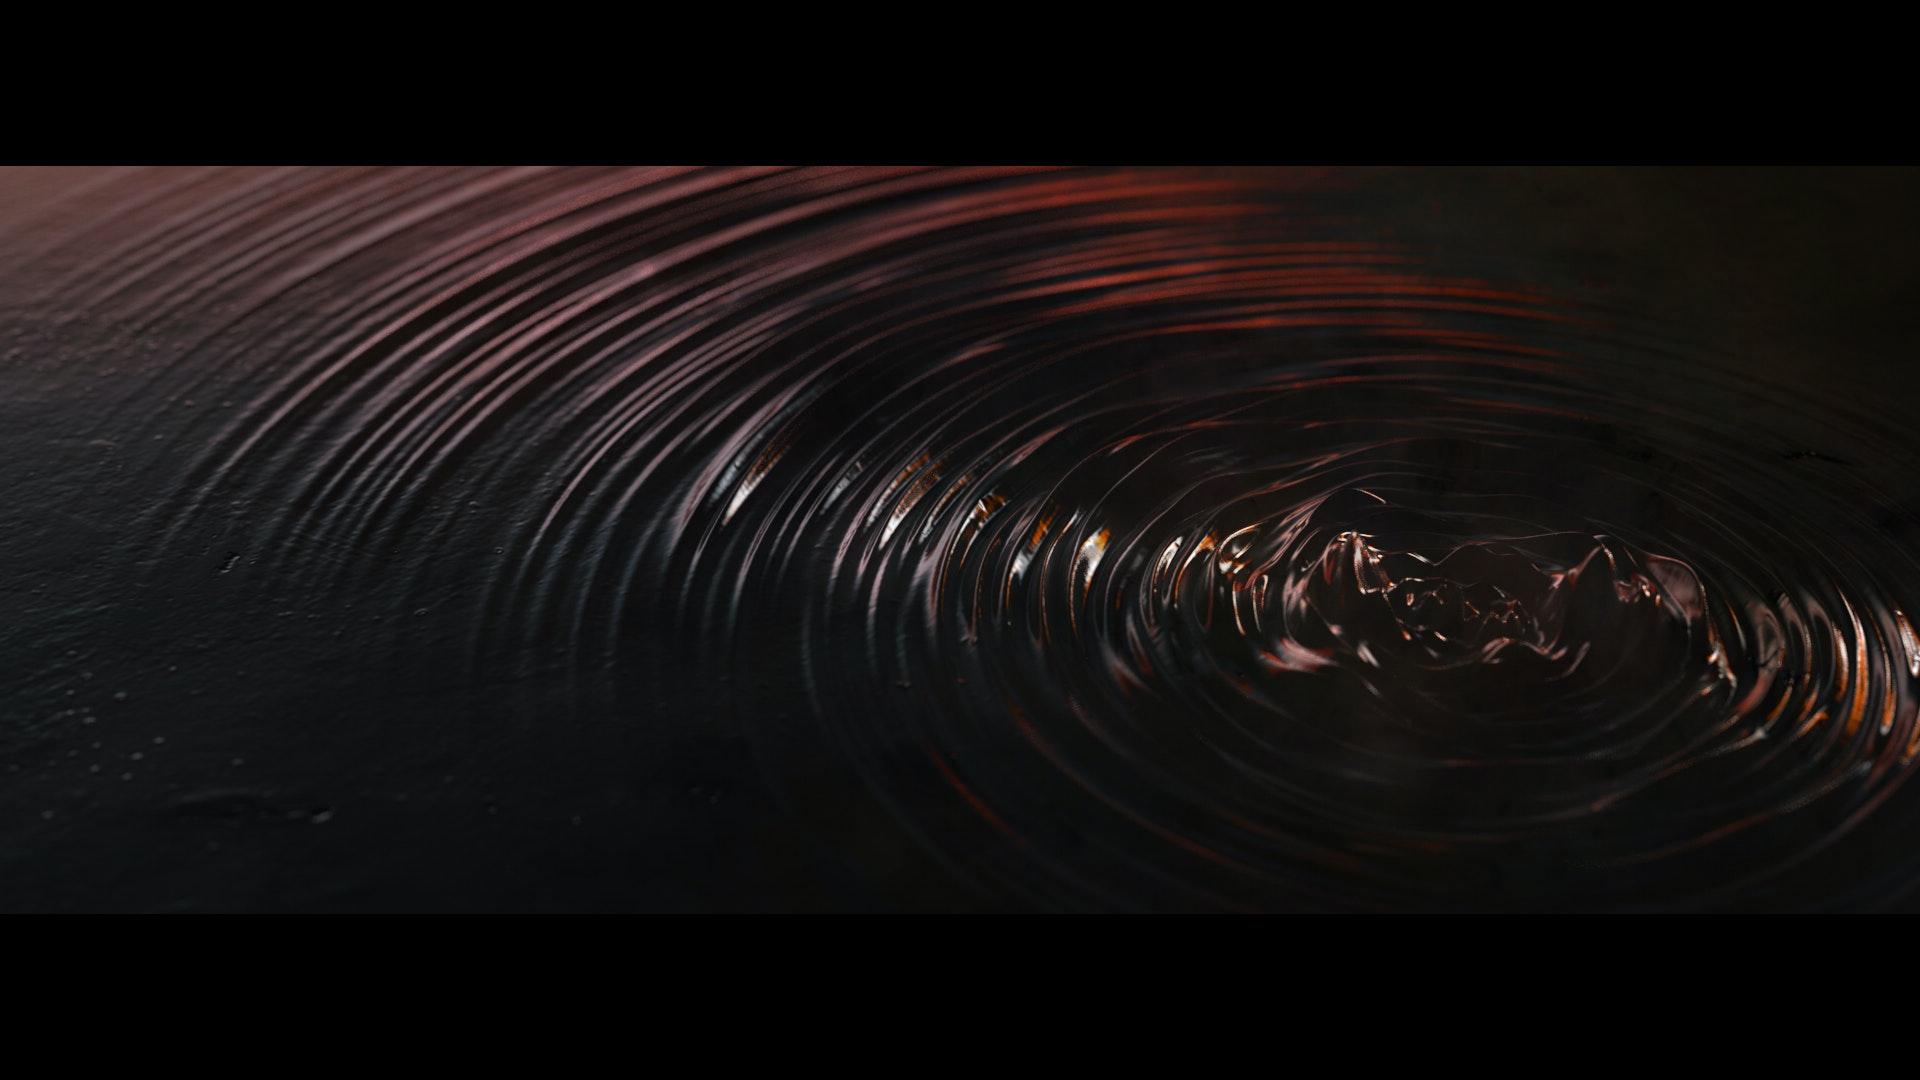 VINICIUS NALDI - ferrofluid_6_0035